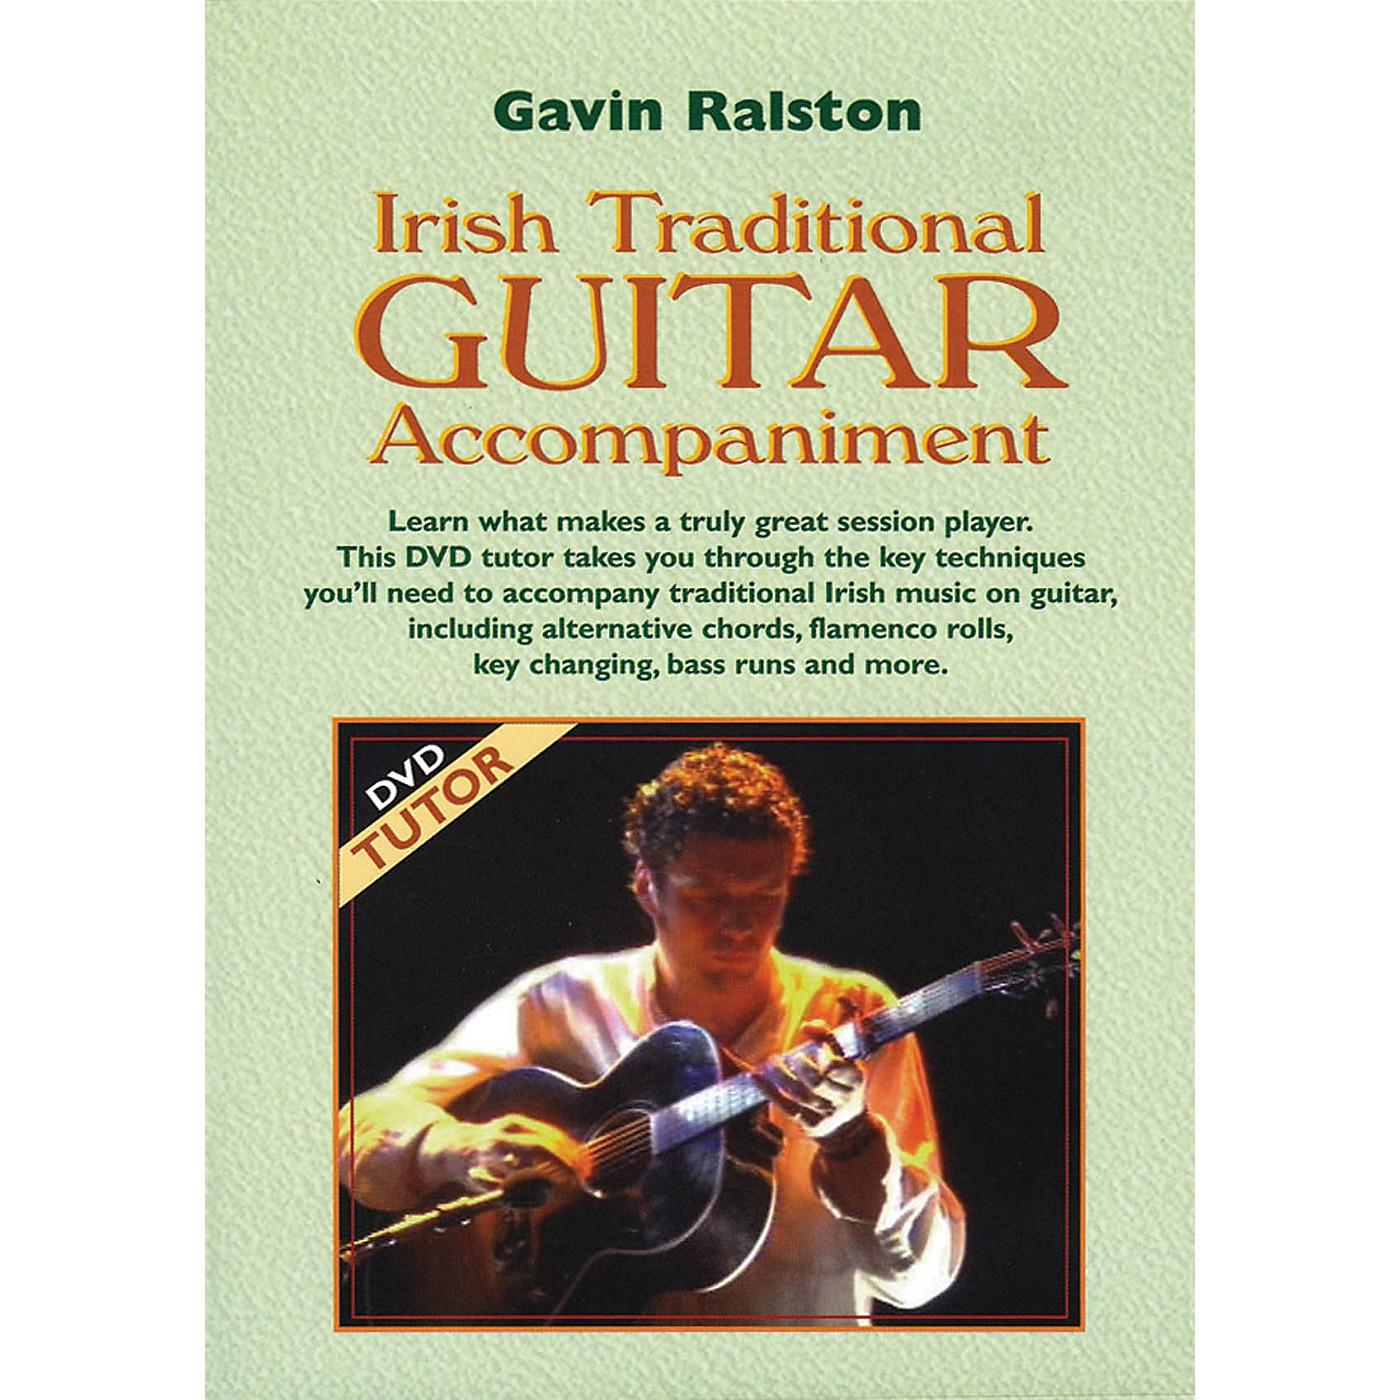 Waltons Irish Traditional Guitar Accompaniment Waltons Irish Music Dvd Series DVD Written by Gavin Ralston thumbnail